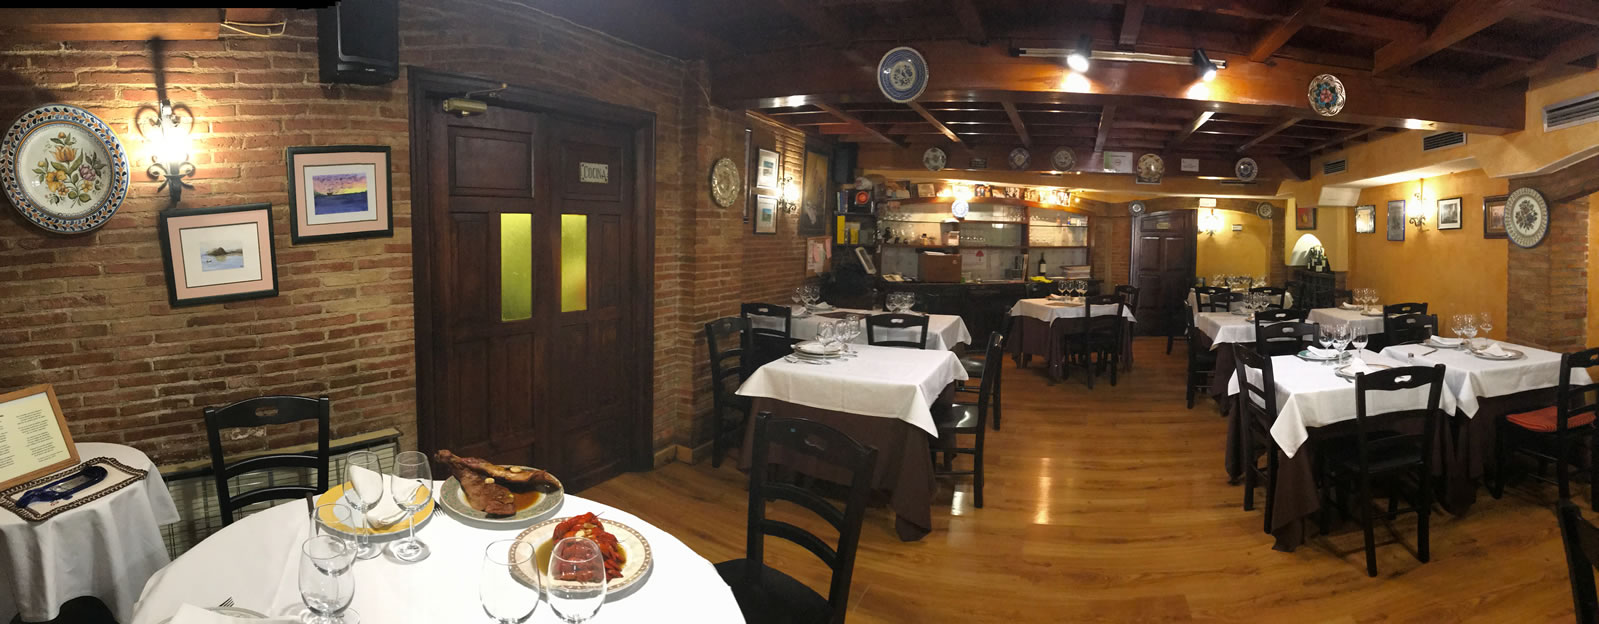 Restaurante Casa Garrido: Vista General del Restaurante Casa Garrido (Soria)